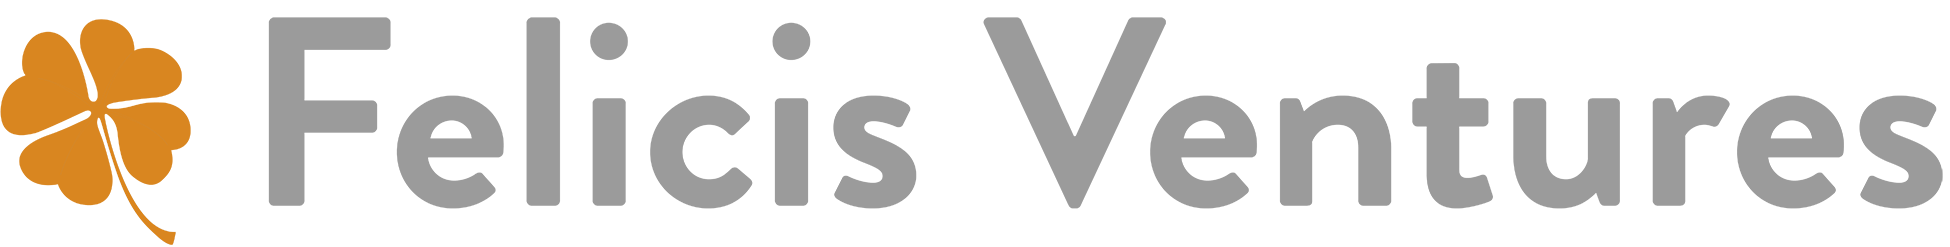 Felicis Ventures logo